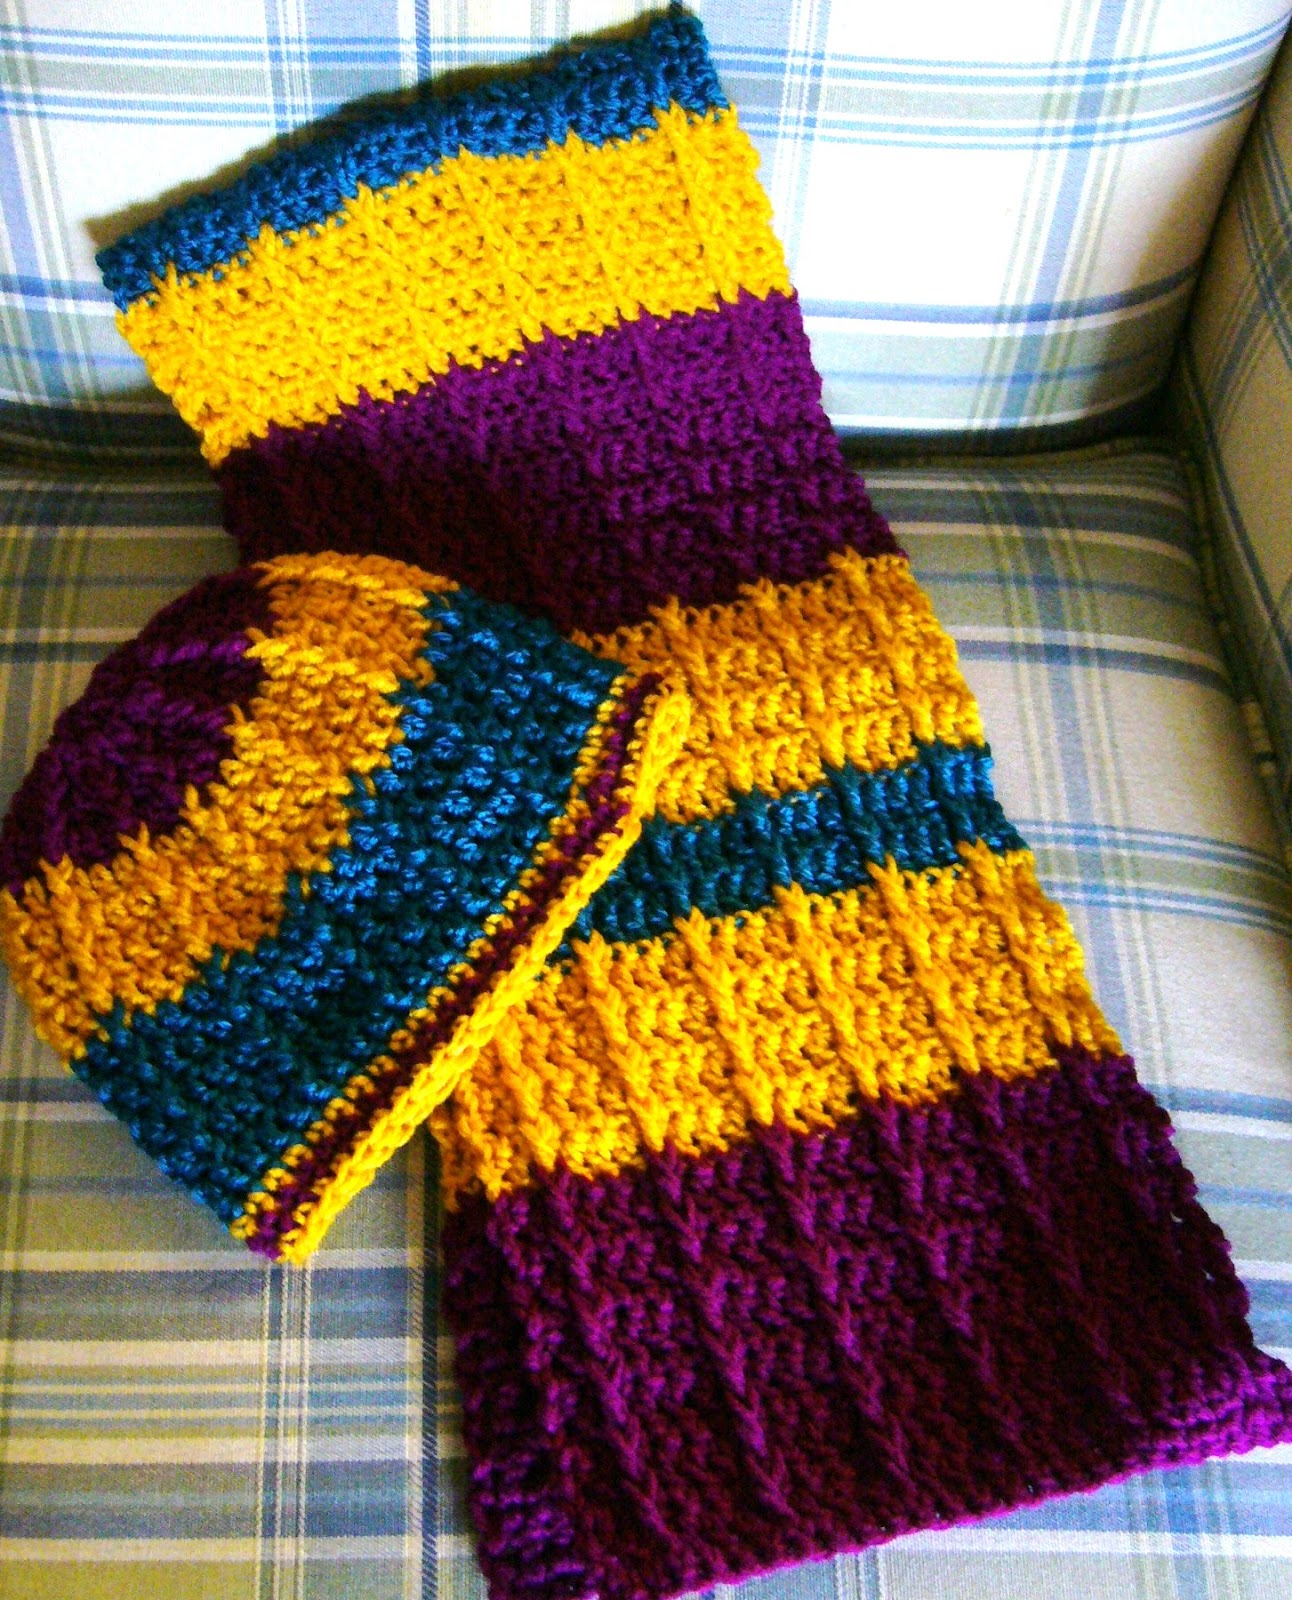 Simply Shoeboxes: Double Crochet Front Post Crochet Scarf